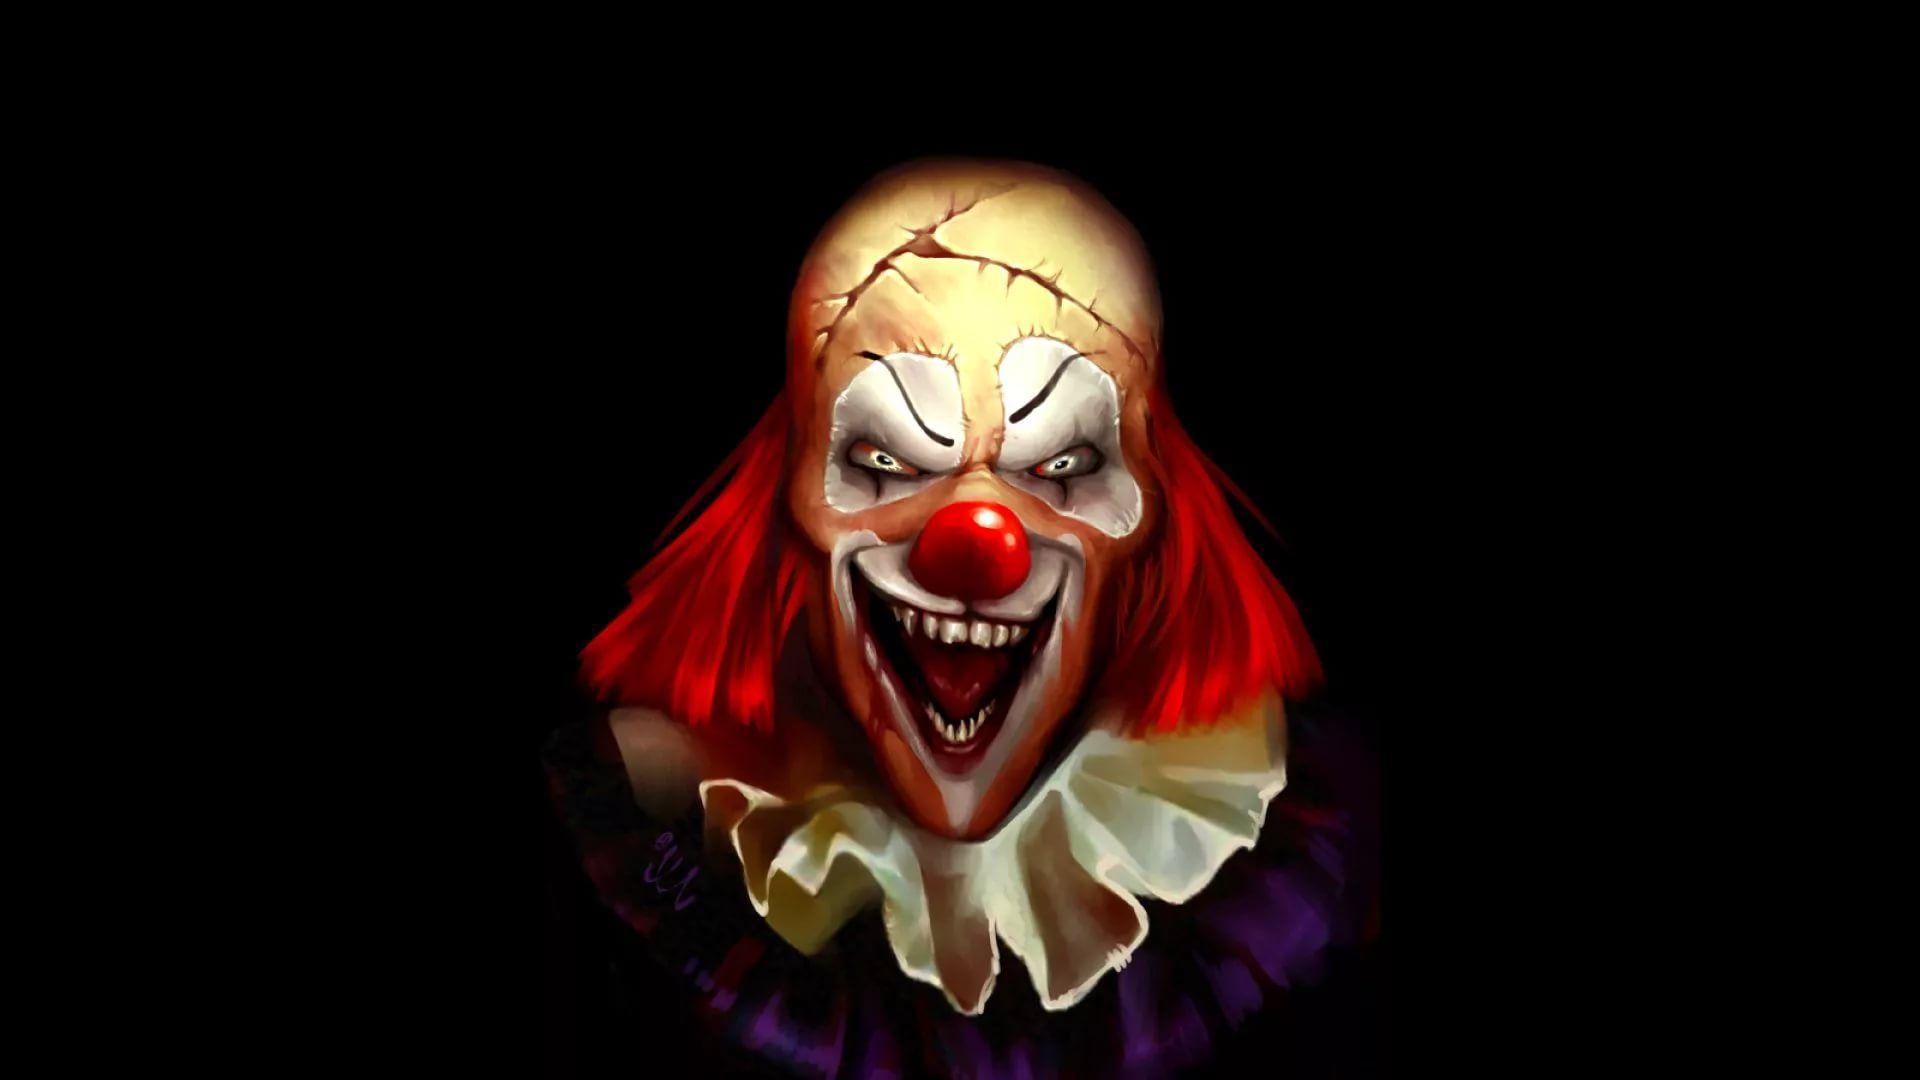 Killer Clown background wallpaper